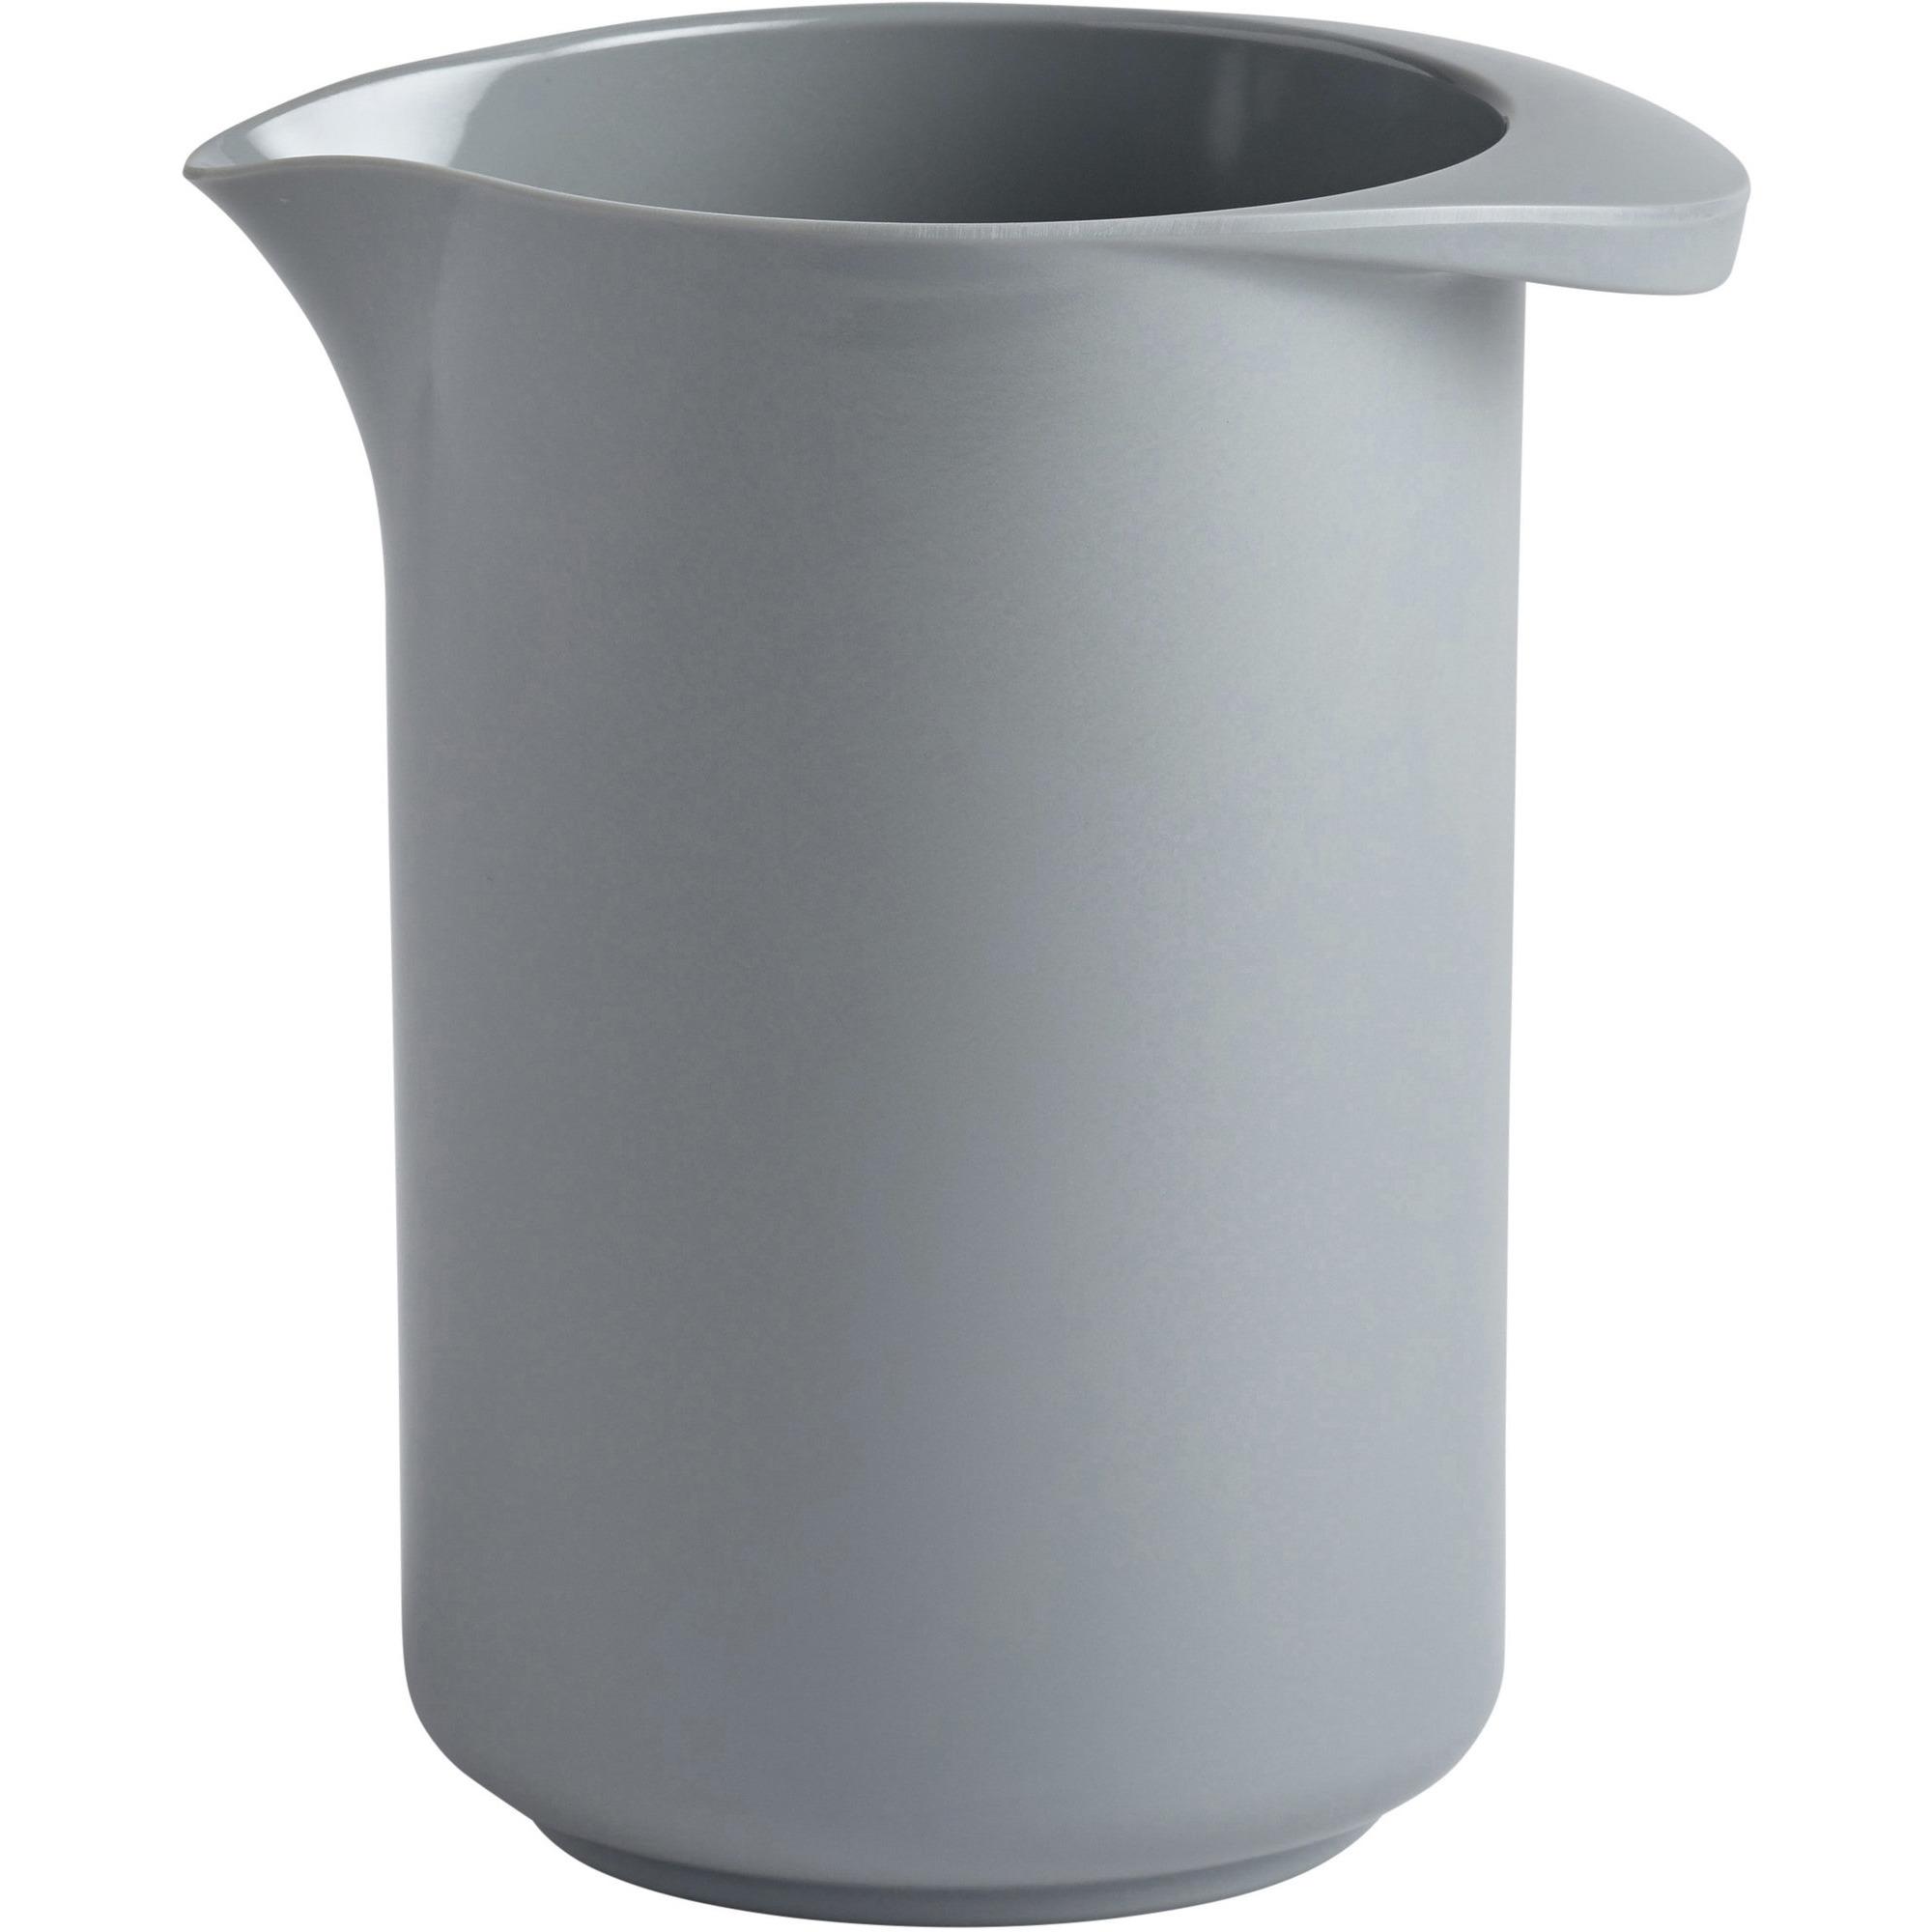 Rosti Mepal Mixkanna 05 liter grå